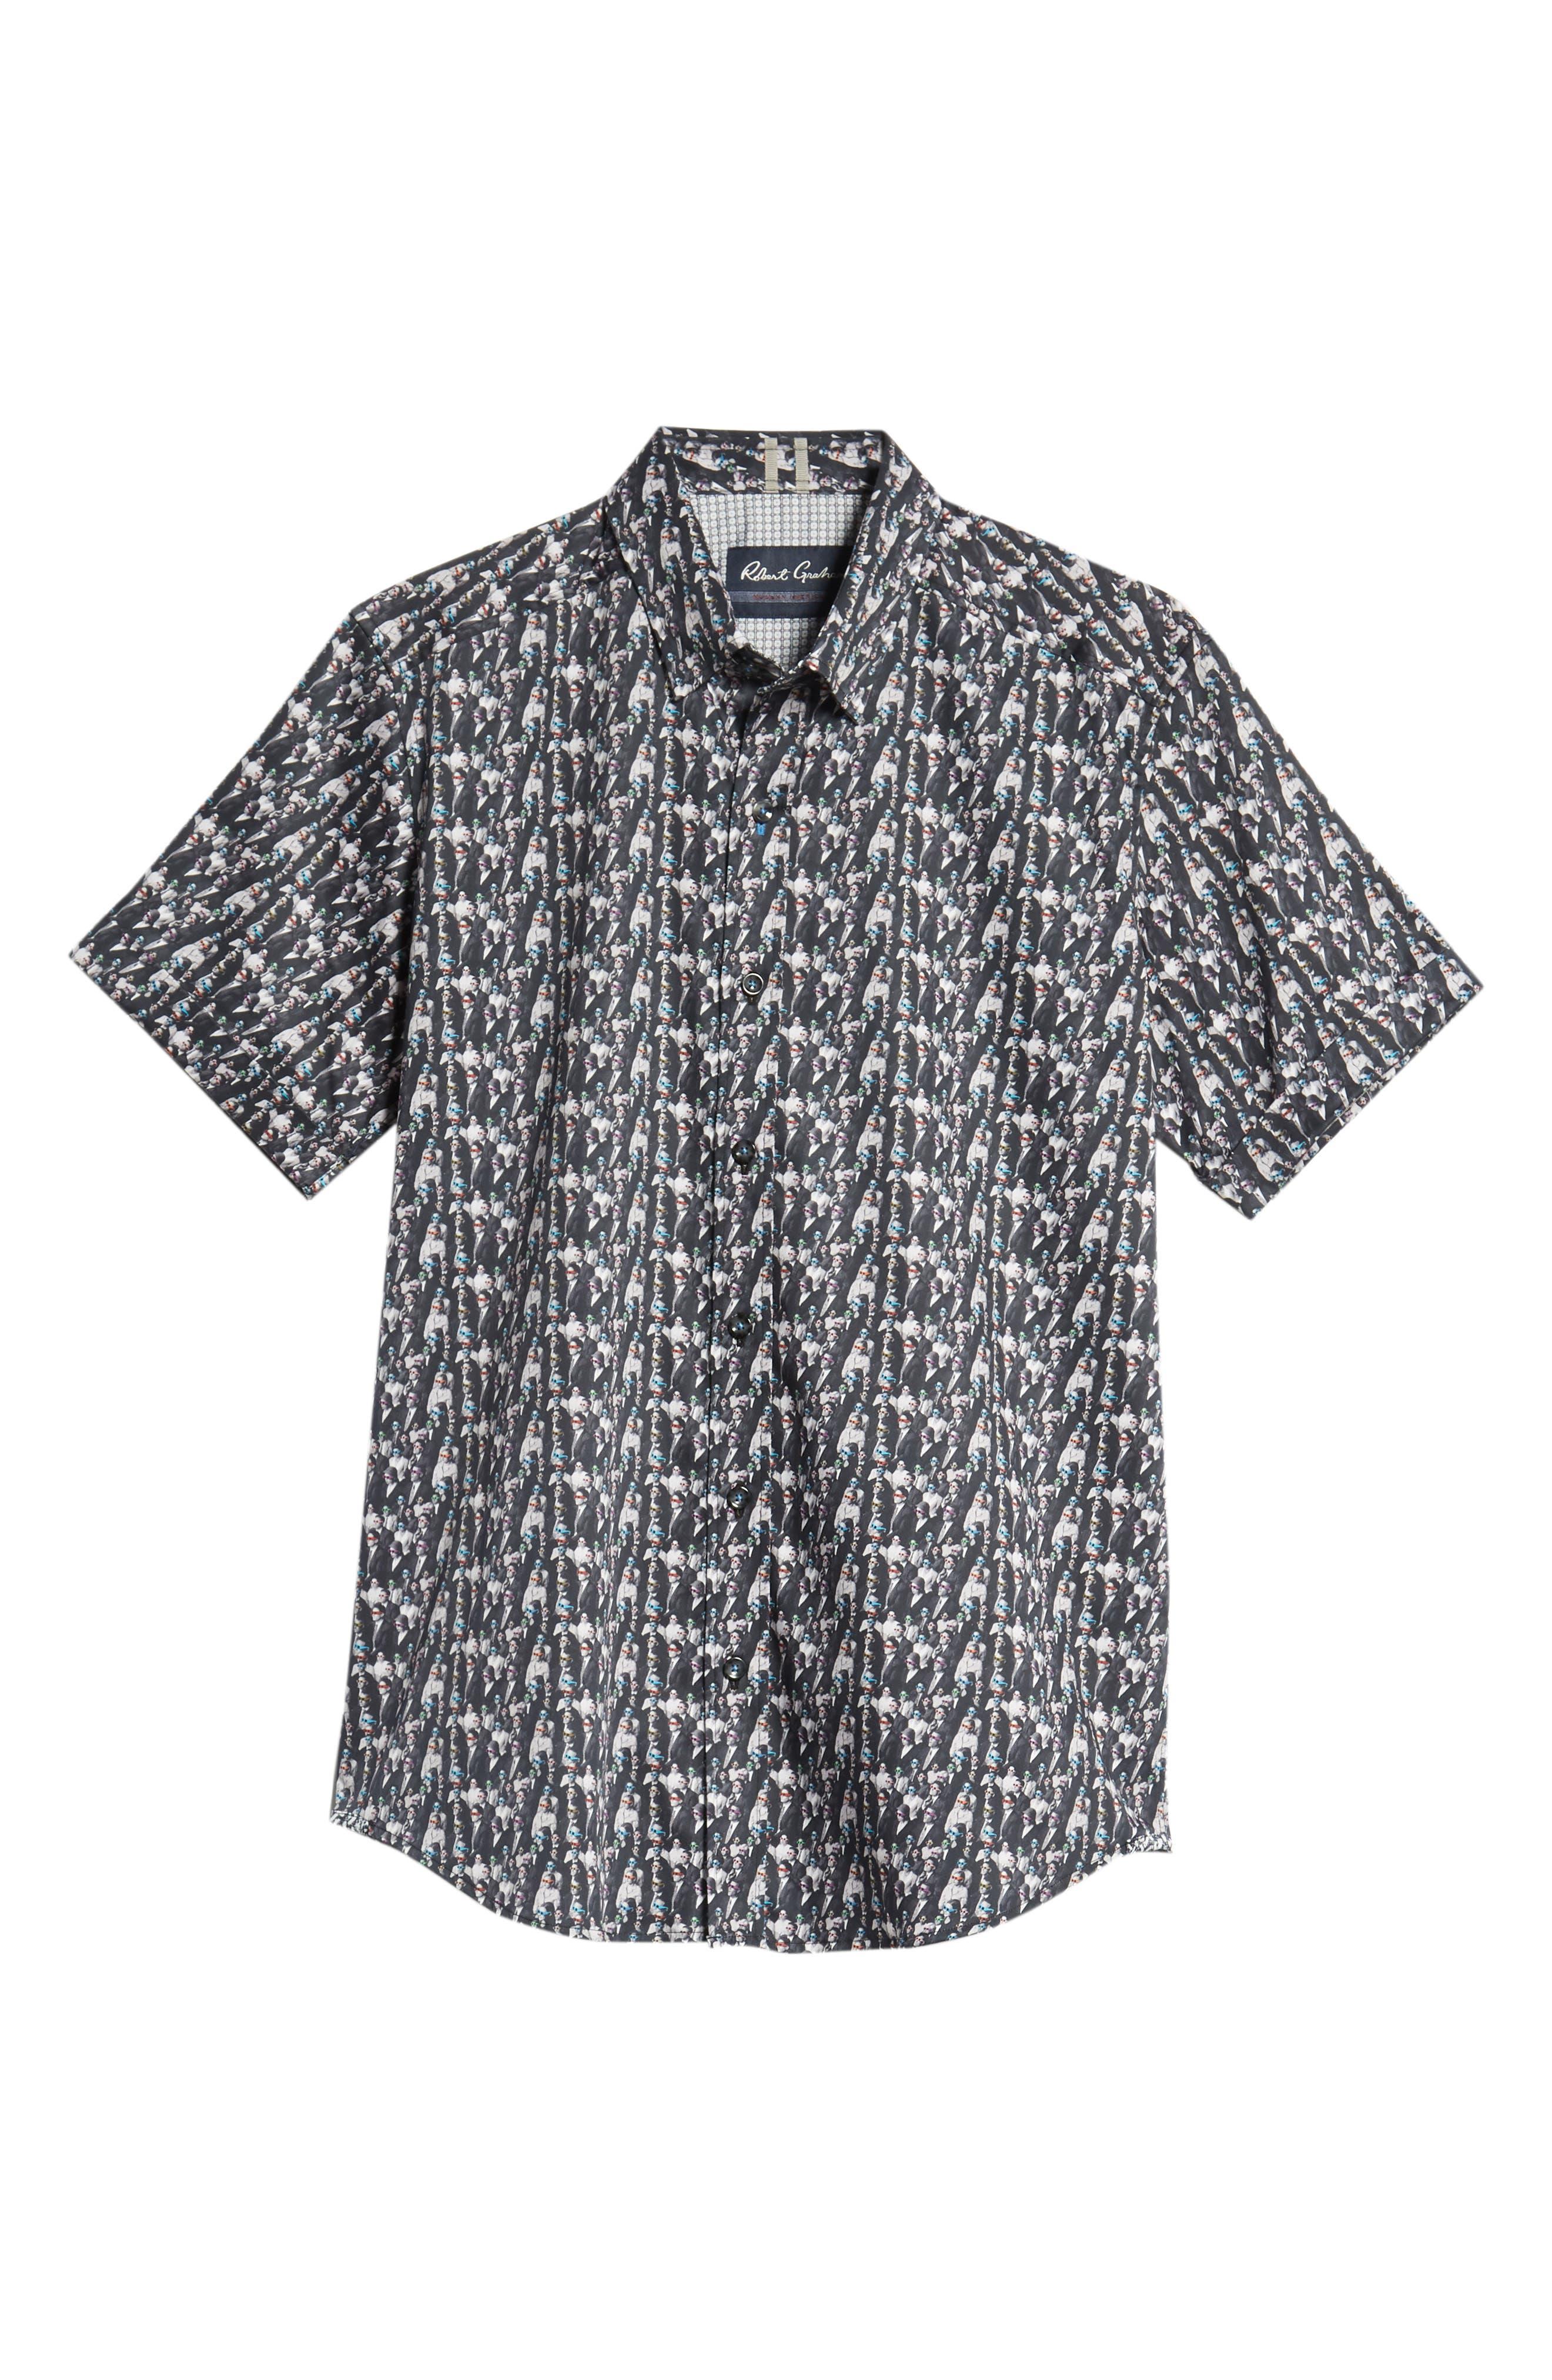 ROBERT GRAHAM,                             Cinema Tailored Fit Sport Shirt,                             Alternate thumbnail 5, color,                             001